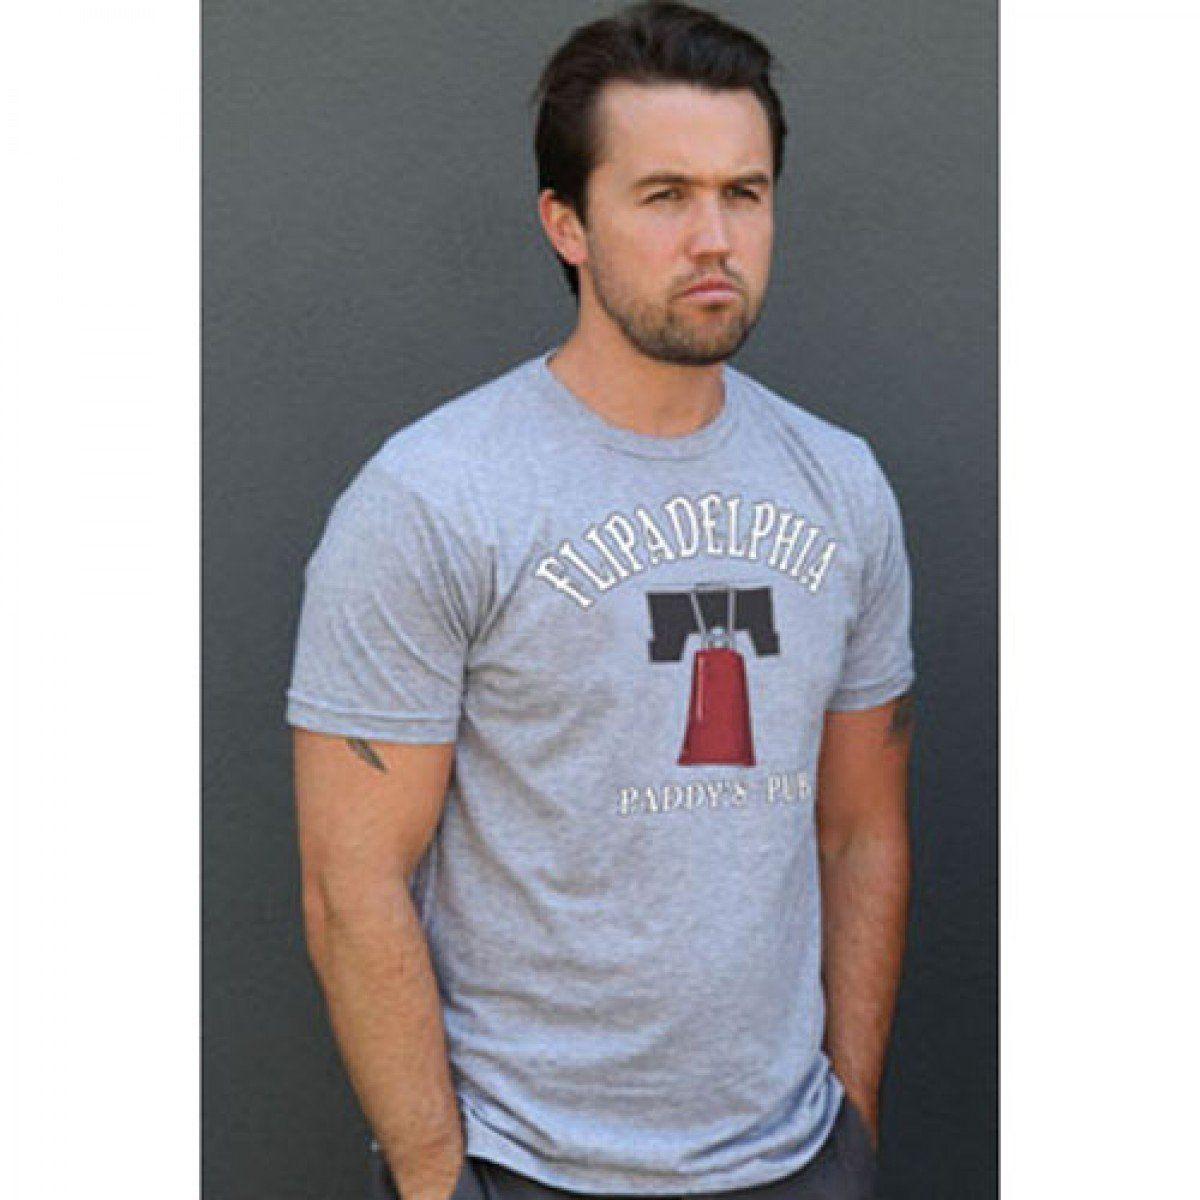 Flipadelphia T-Shirt It's Always Sunny in Philadelphia Paddy's Pub Flip Cup (Mens 2XL)